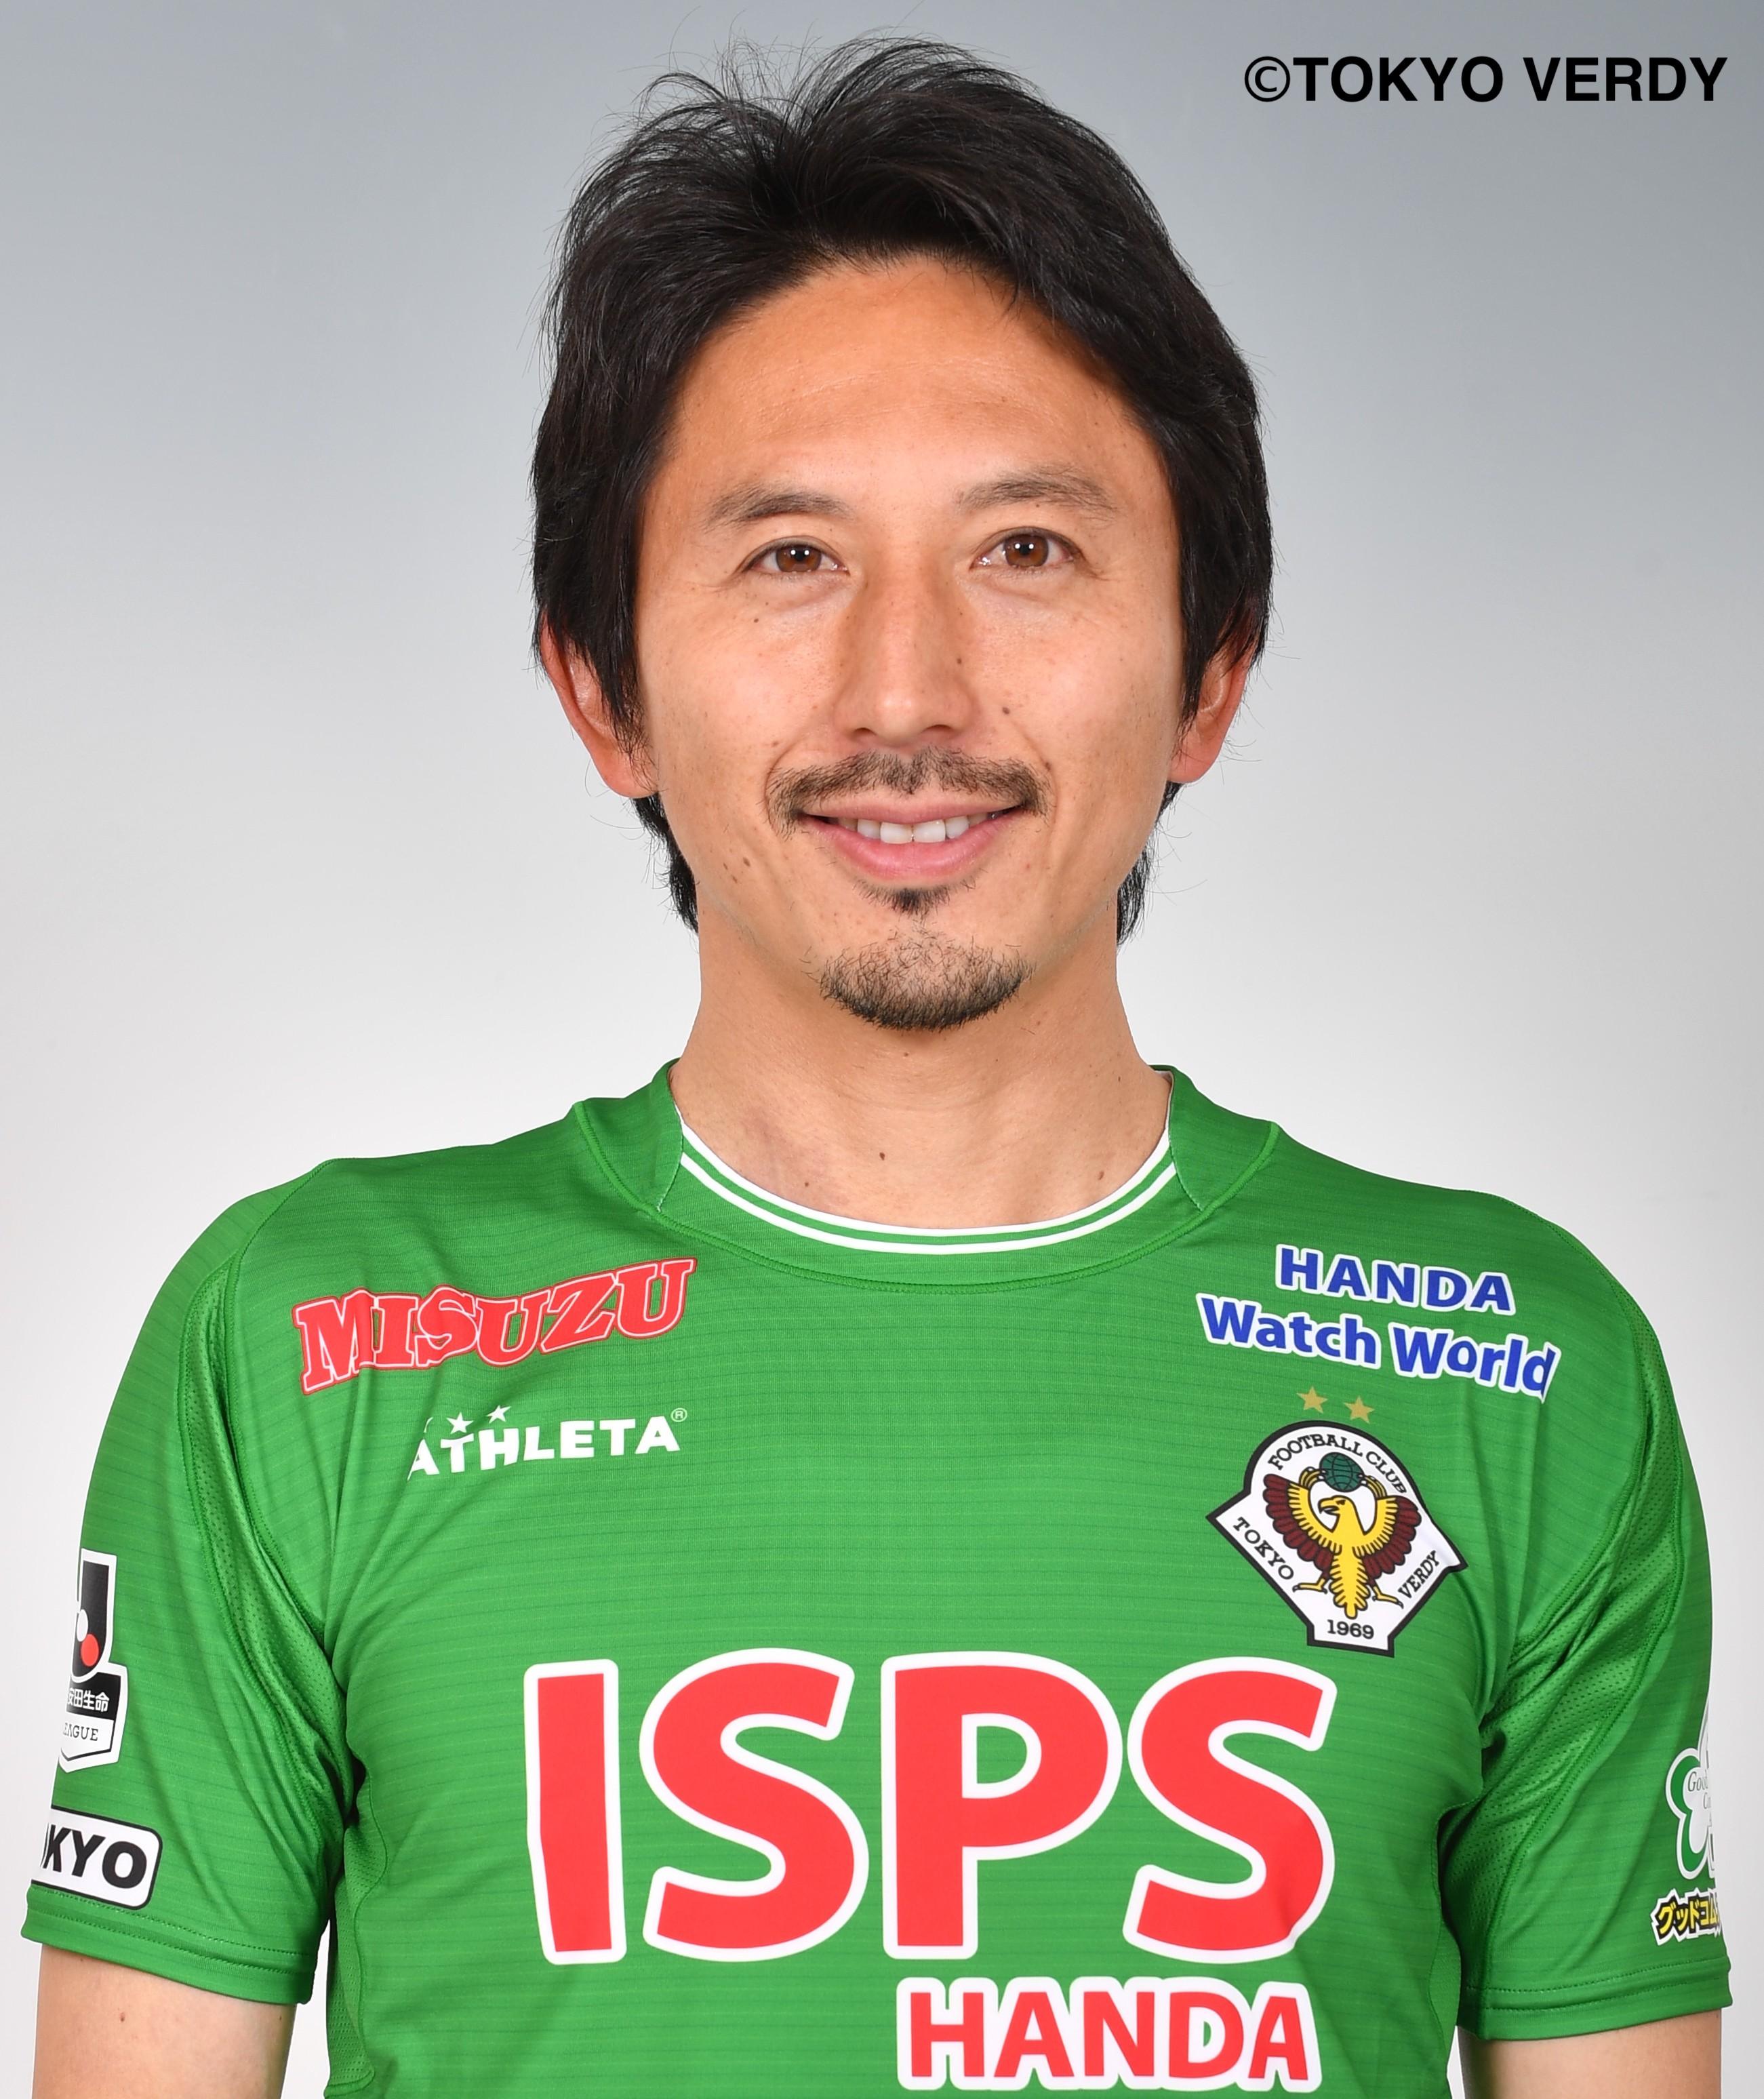 2019_hashimoto.JPG